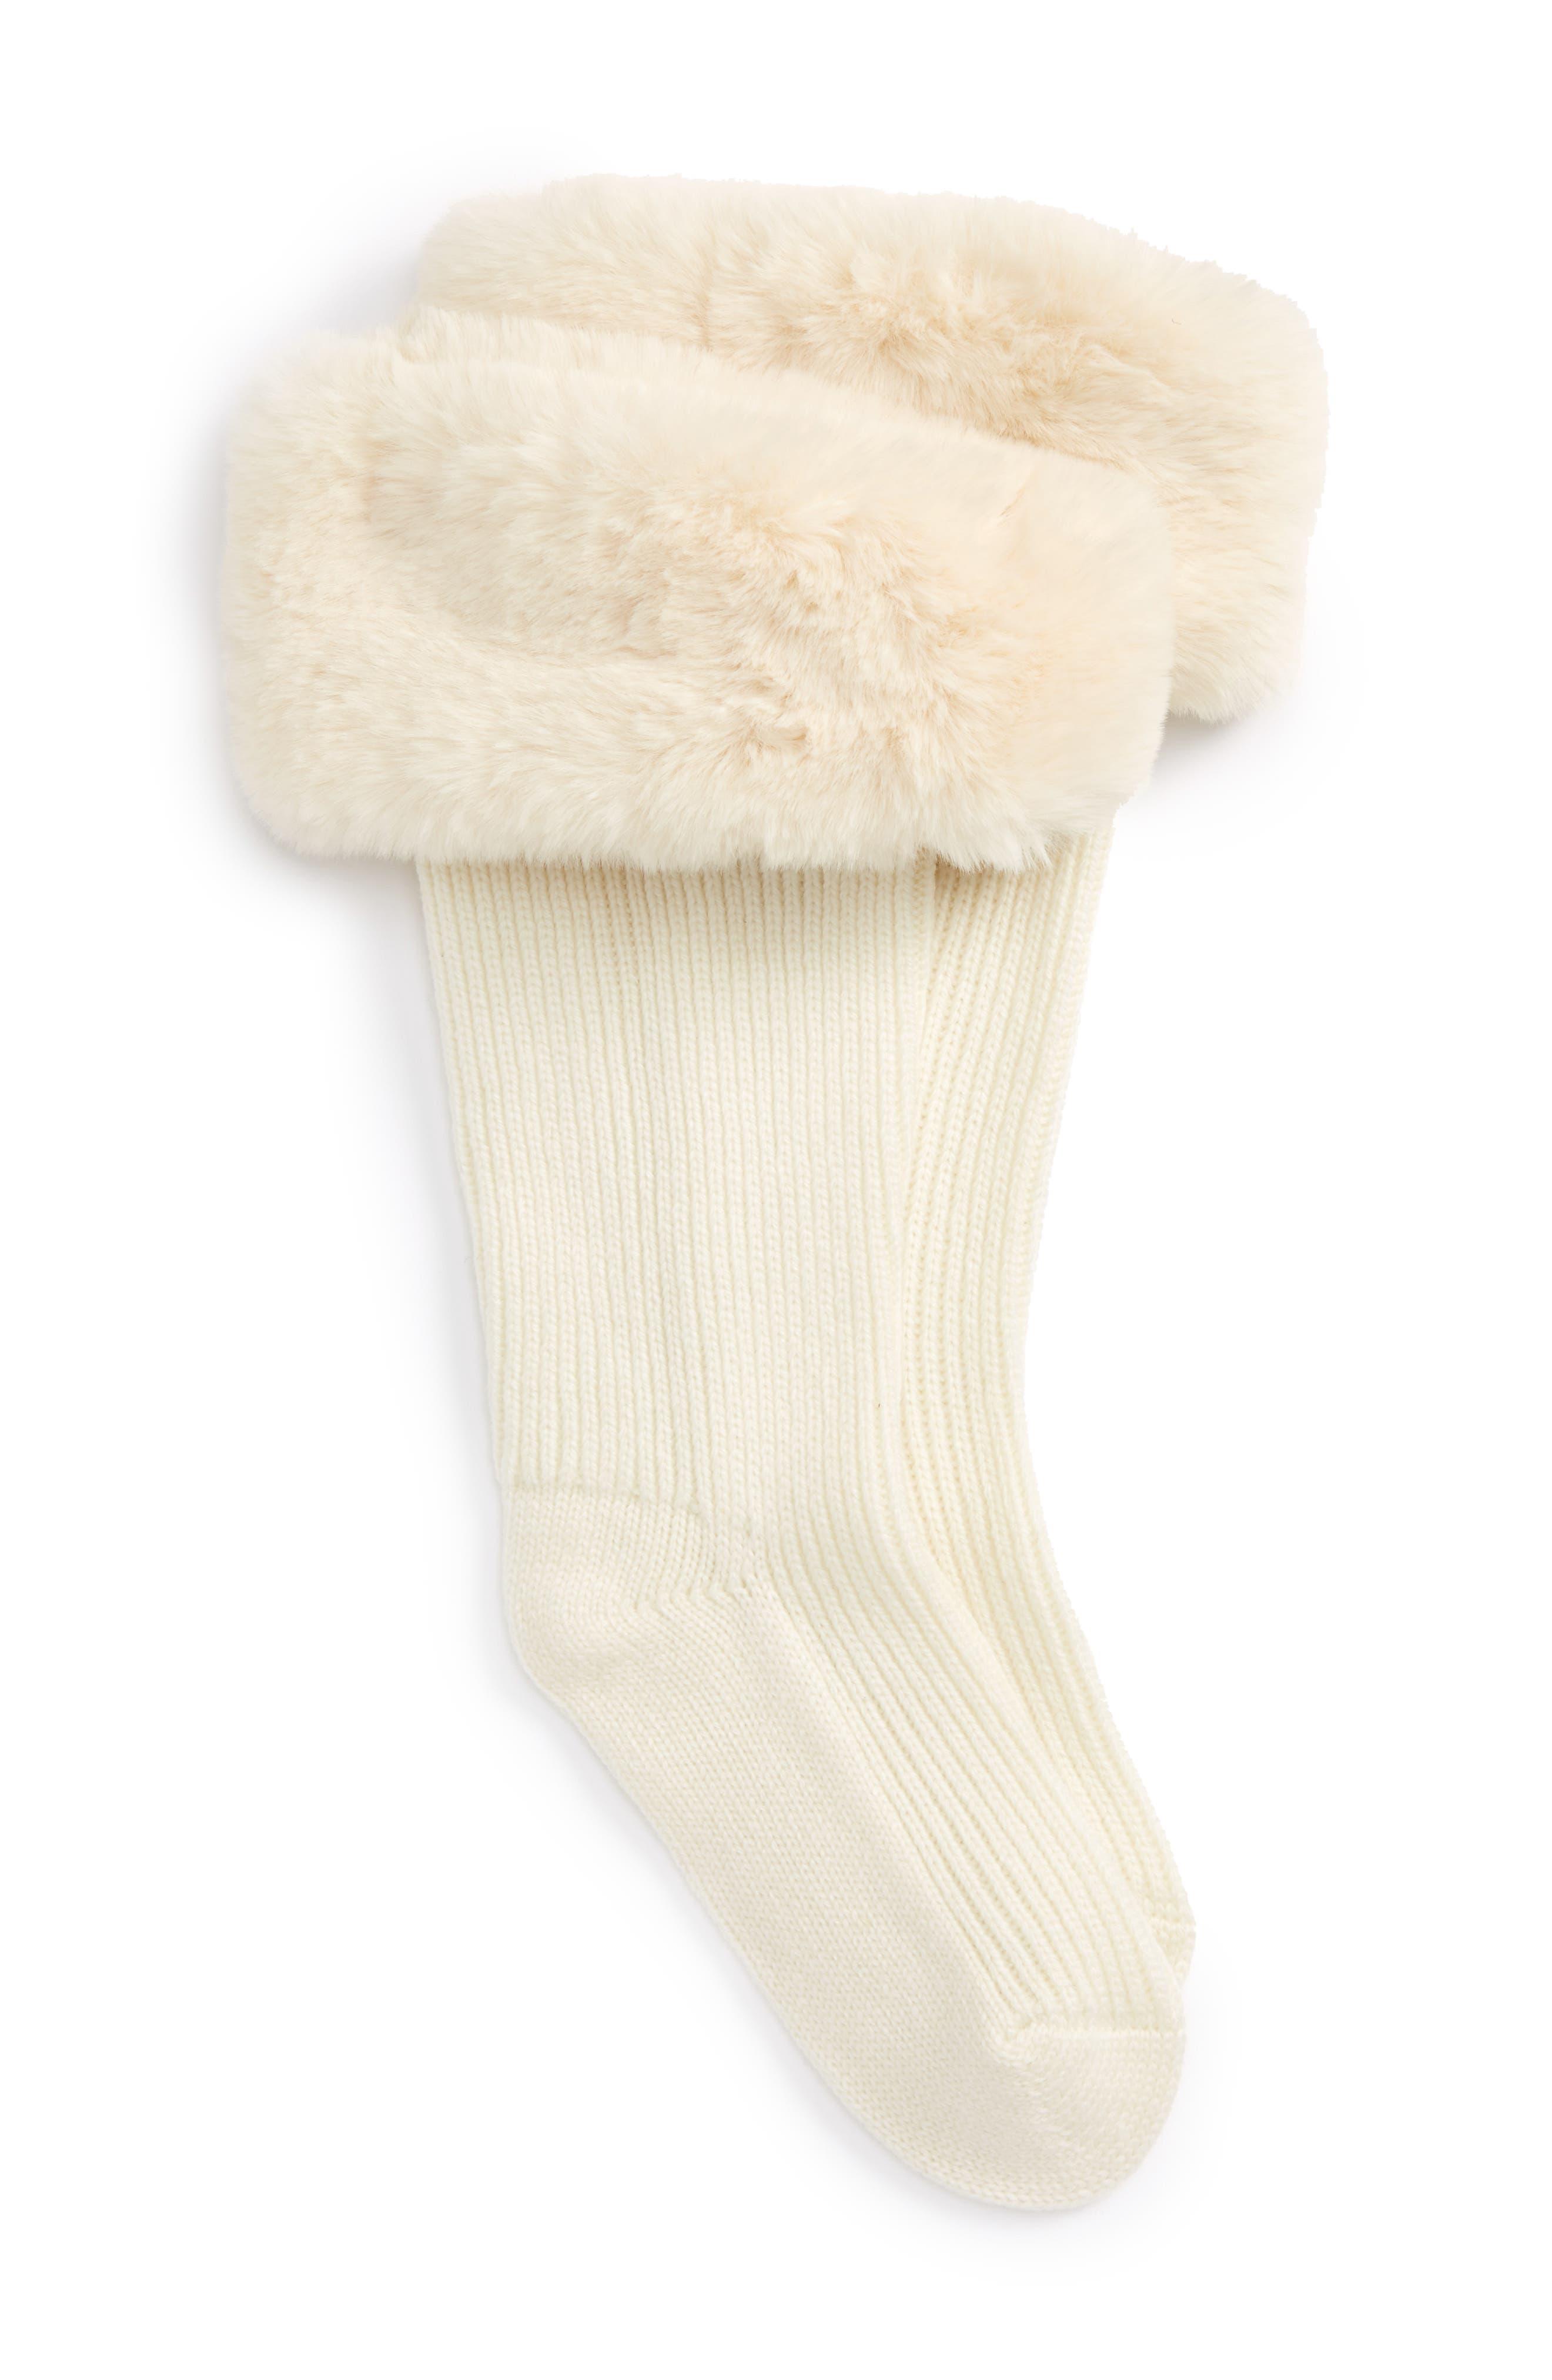 UGGpure<sup>™</sup> Tall Rain Boot Sock,                         Main,                         color, CREAM WOOL